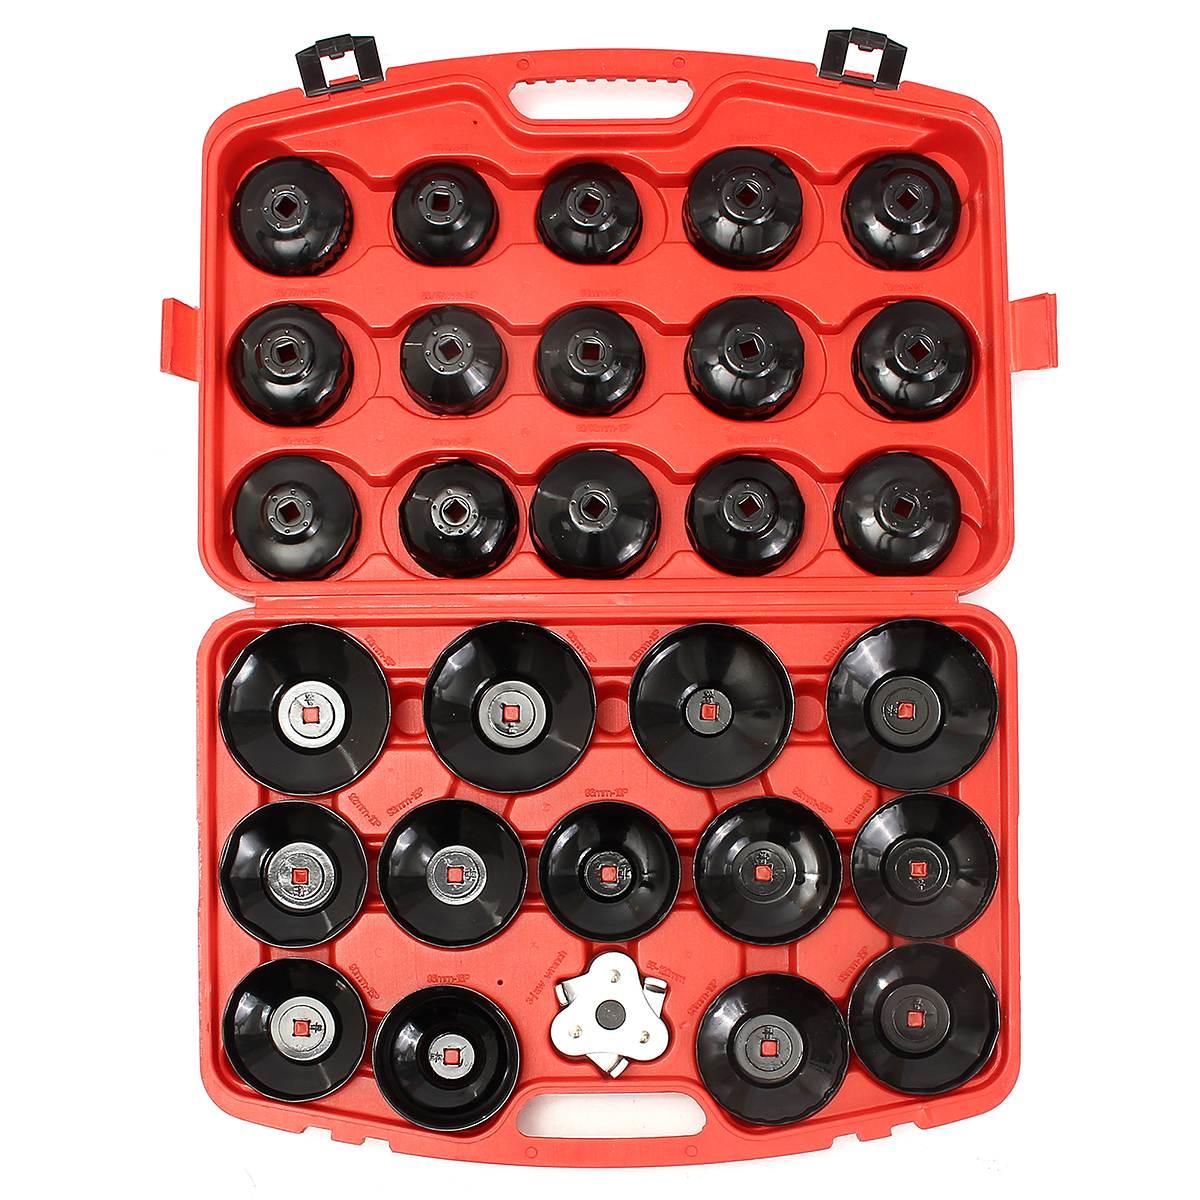 цена на 31pc Oil Filter Removal Wrench Cap Car Garage Tool Set Loosen Tighten Cup Socket